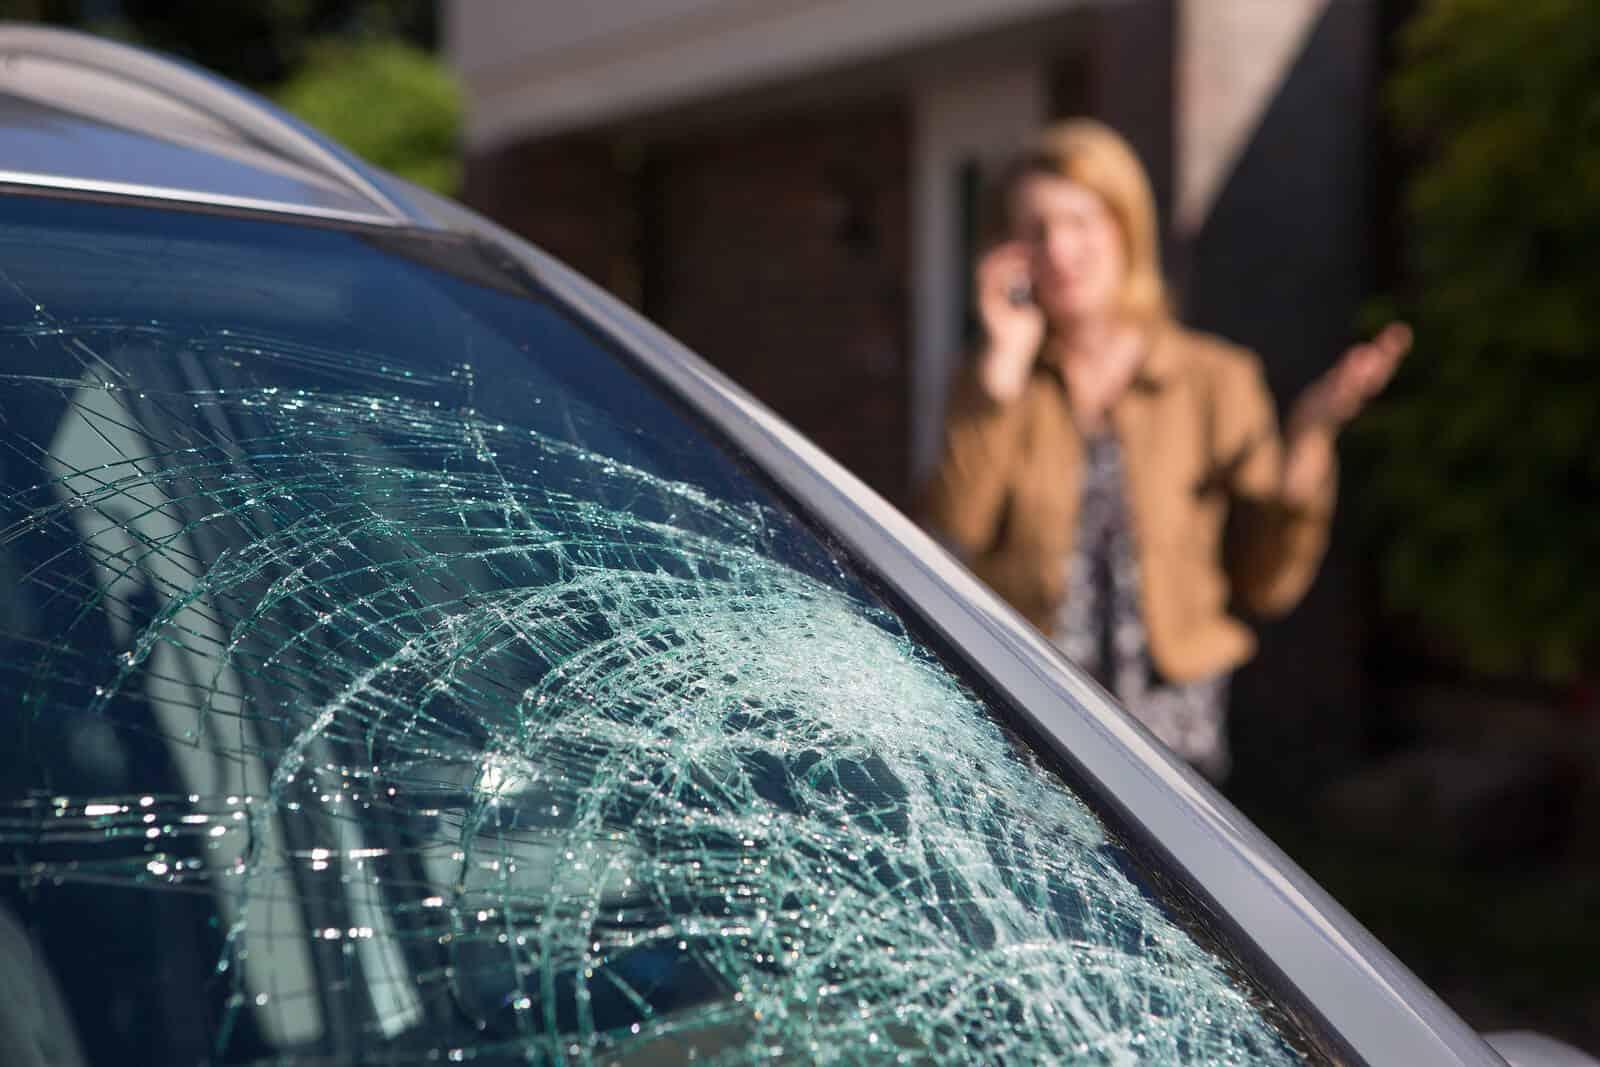 Woman calling about broken windscreen